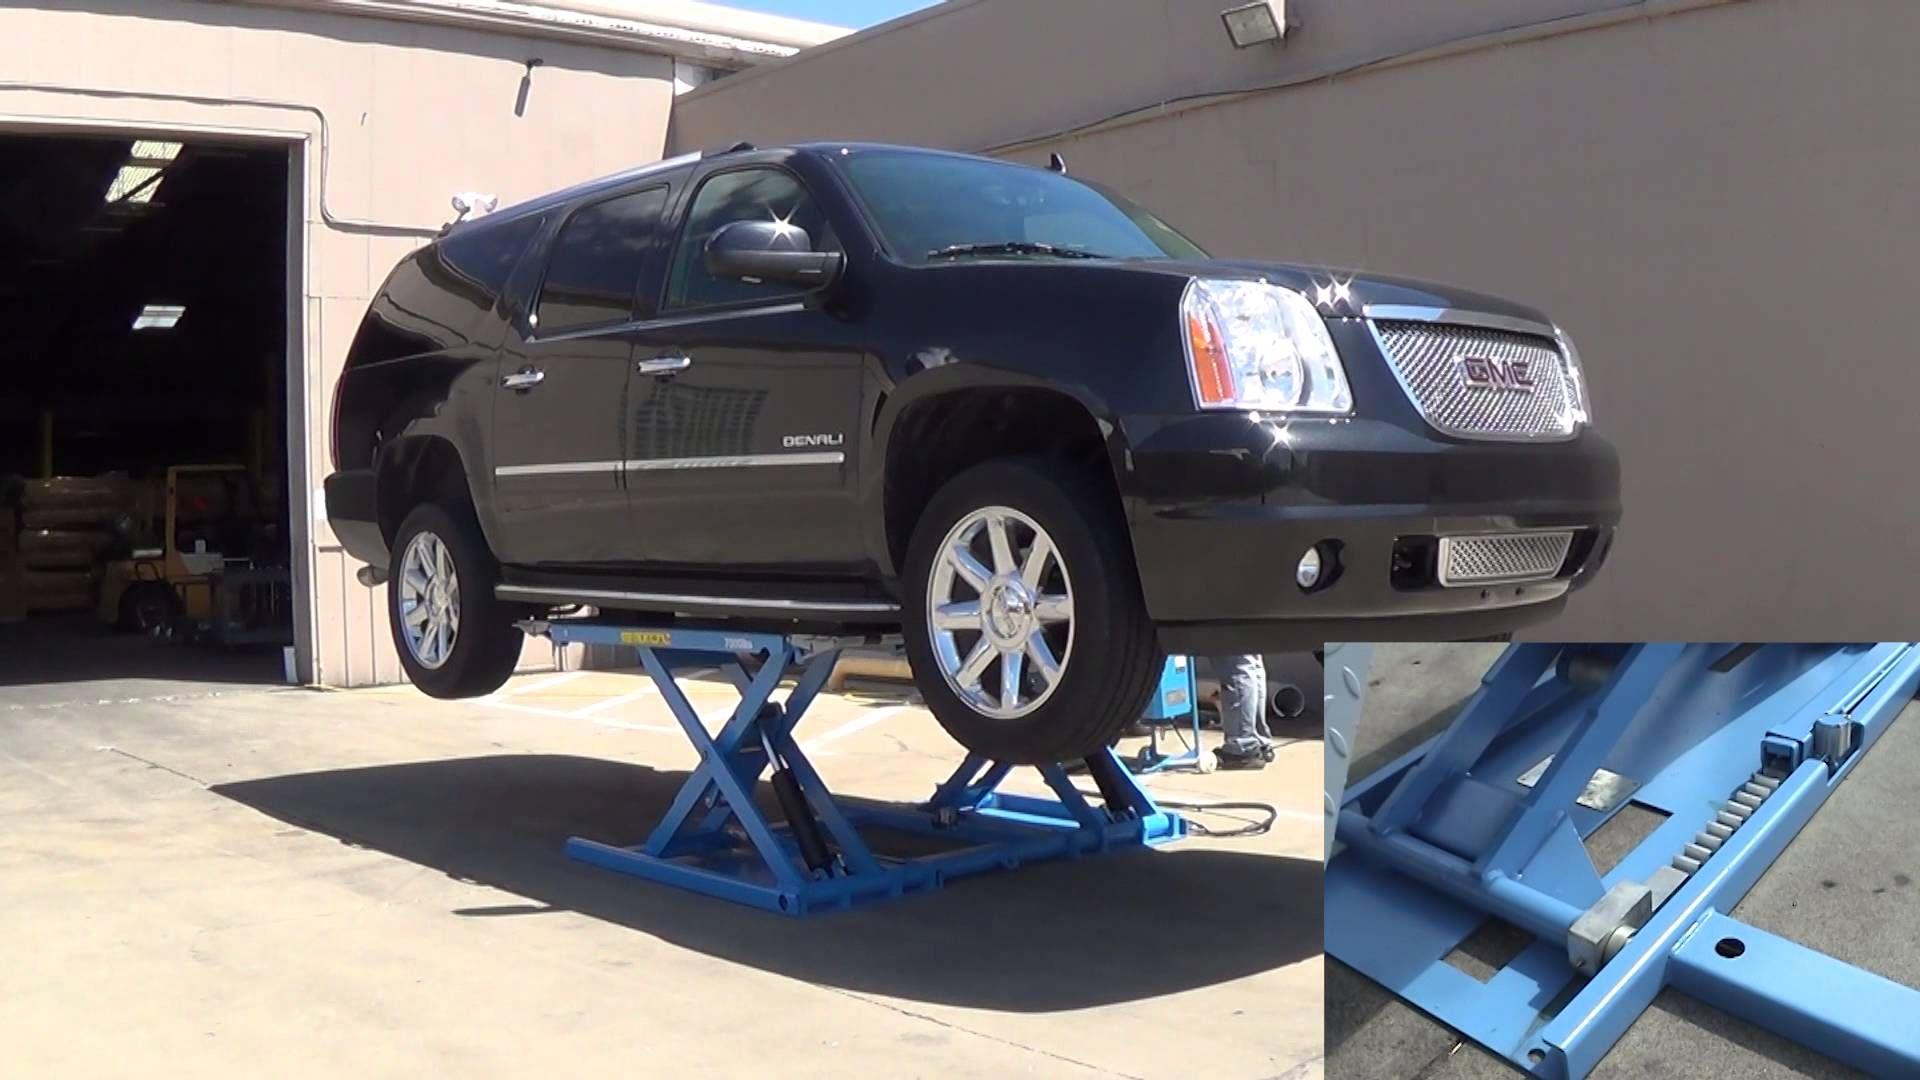 Atlas Kwik Bay 7 000 Lb Mid Rise Lift Lifted Cars Portable Lifts Kwik